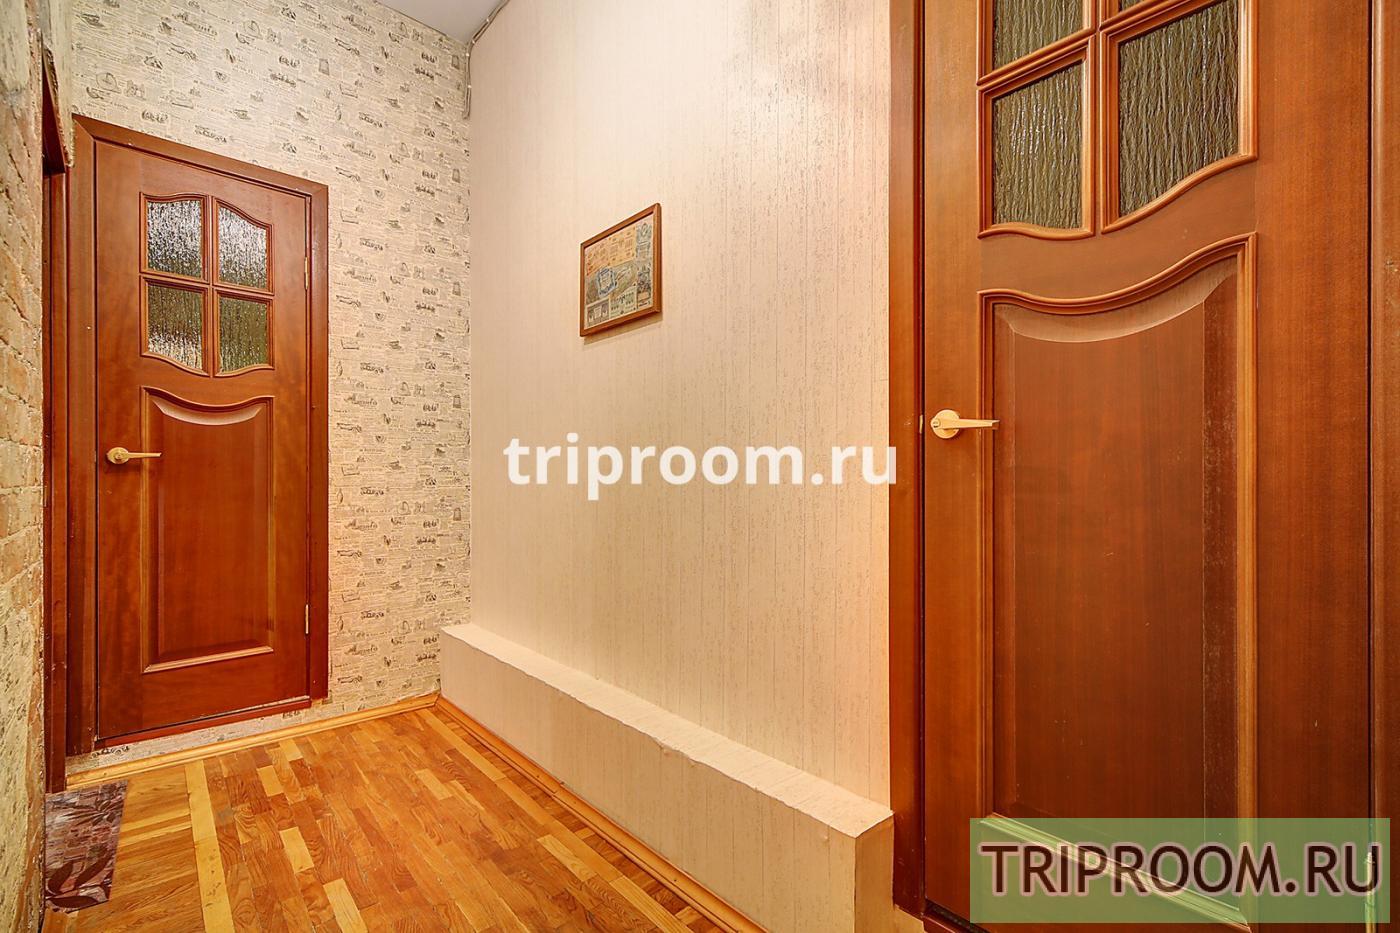 1-комнатная квартира посуточно (вариант № 15445), ул. Лиговский проспект, фото № 17